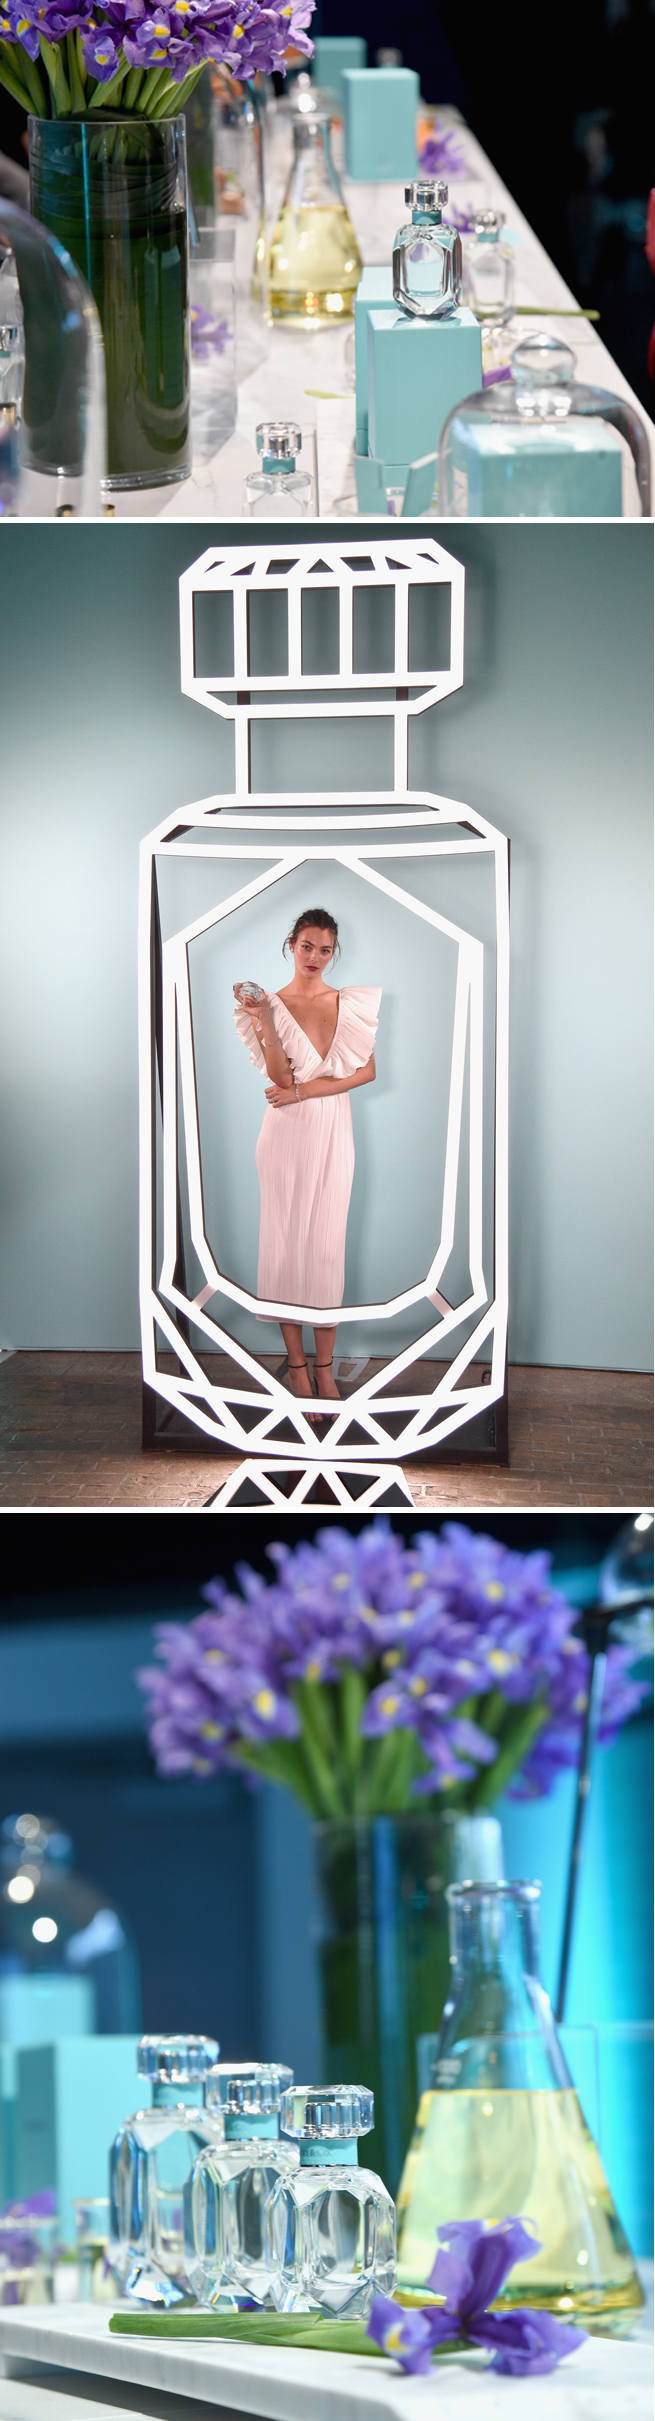 Perfect Wedding Magazine, Perfect Wedding Blog, New York Fashion Week, Tiffany&Co, Tiffany Fragrance, Bridal Fragrance, Arts, Entertainment,